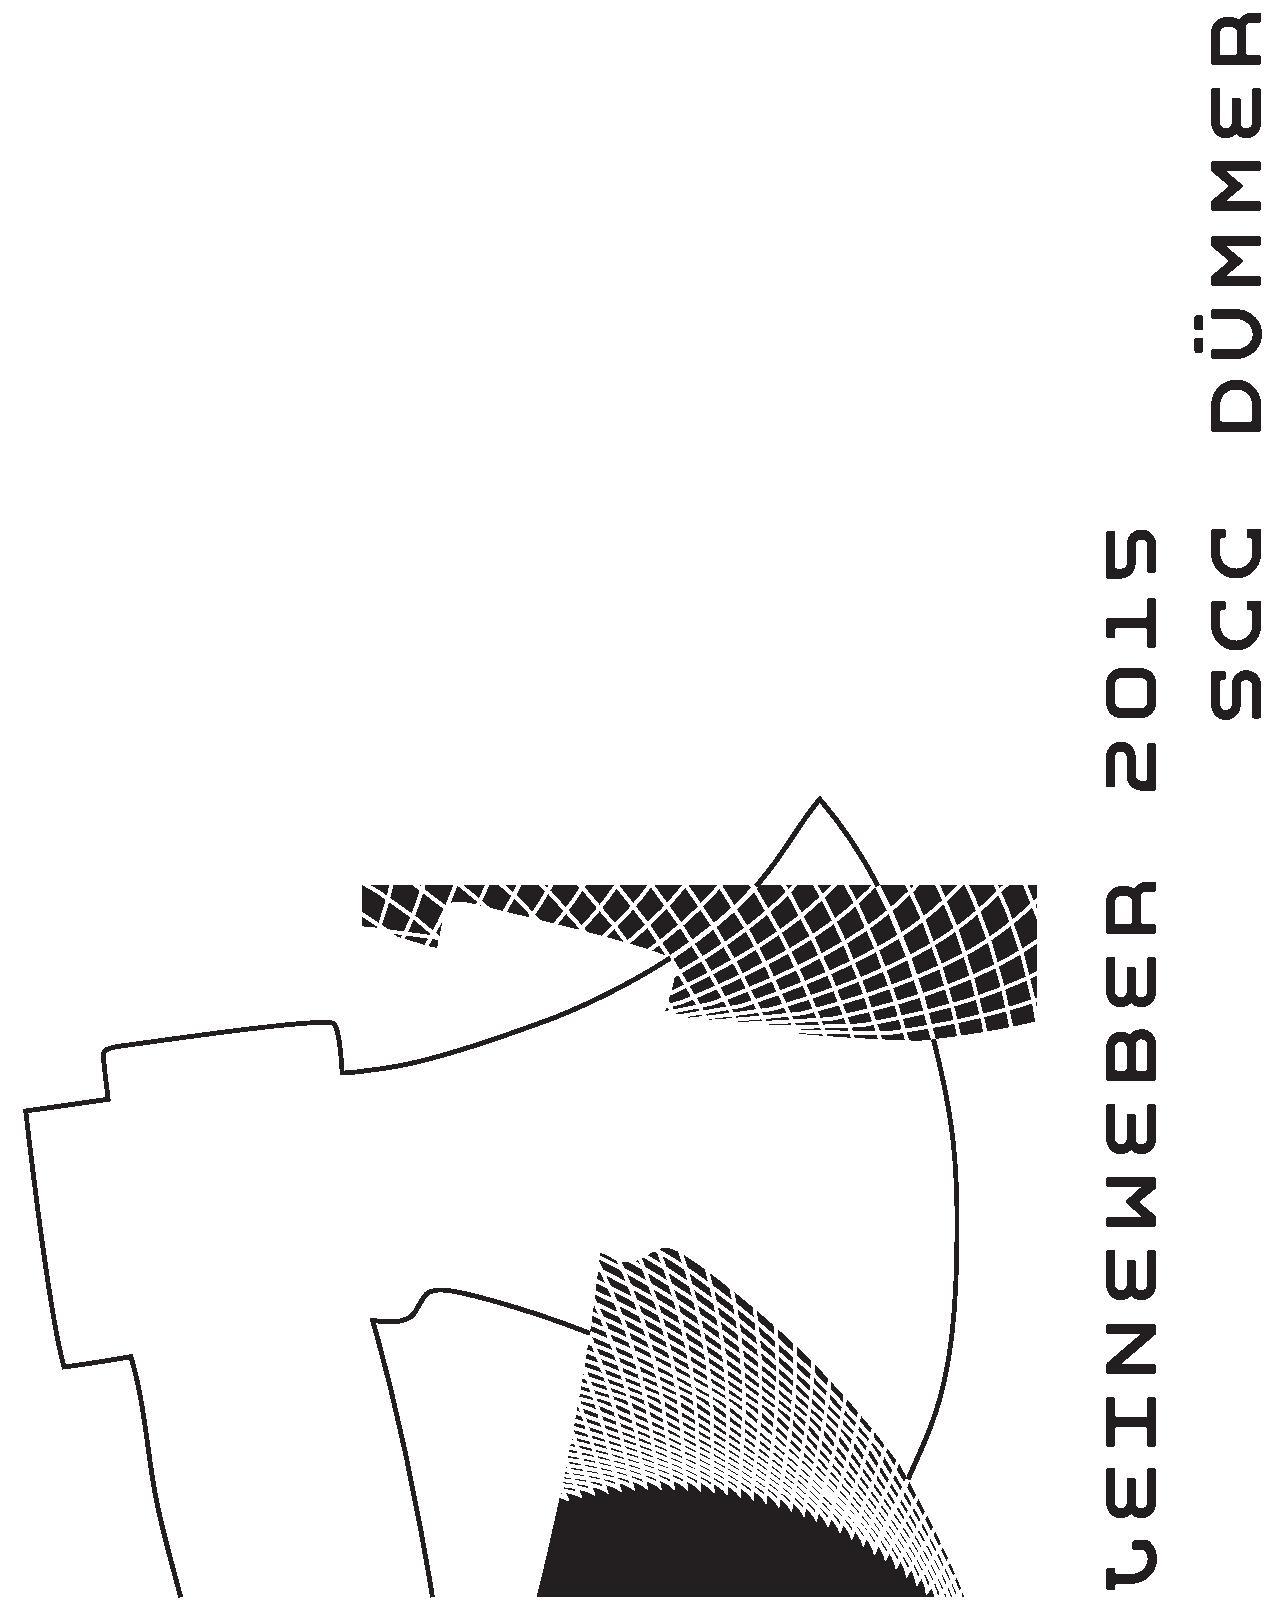 leineweber2015